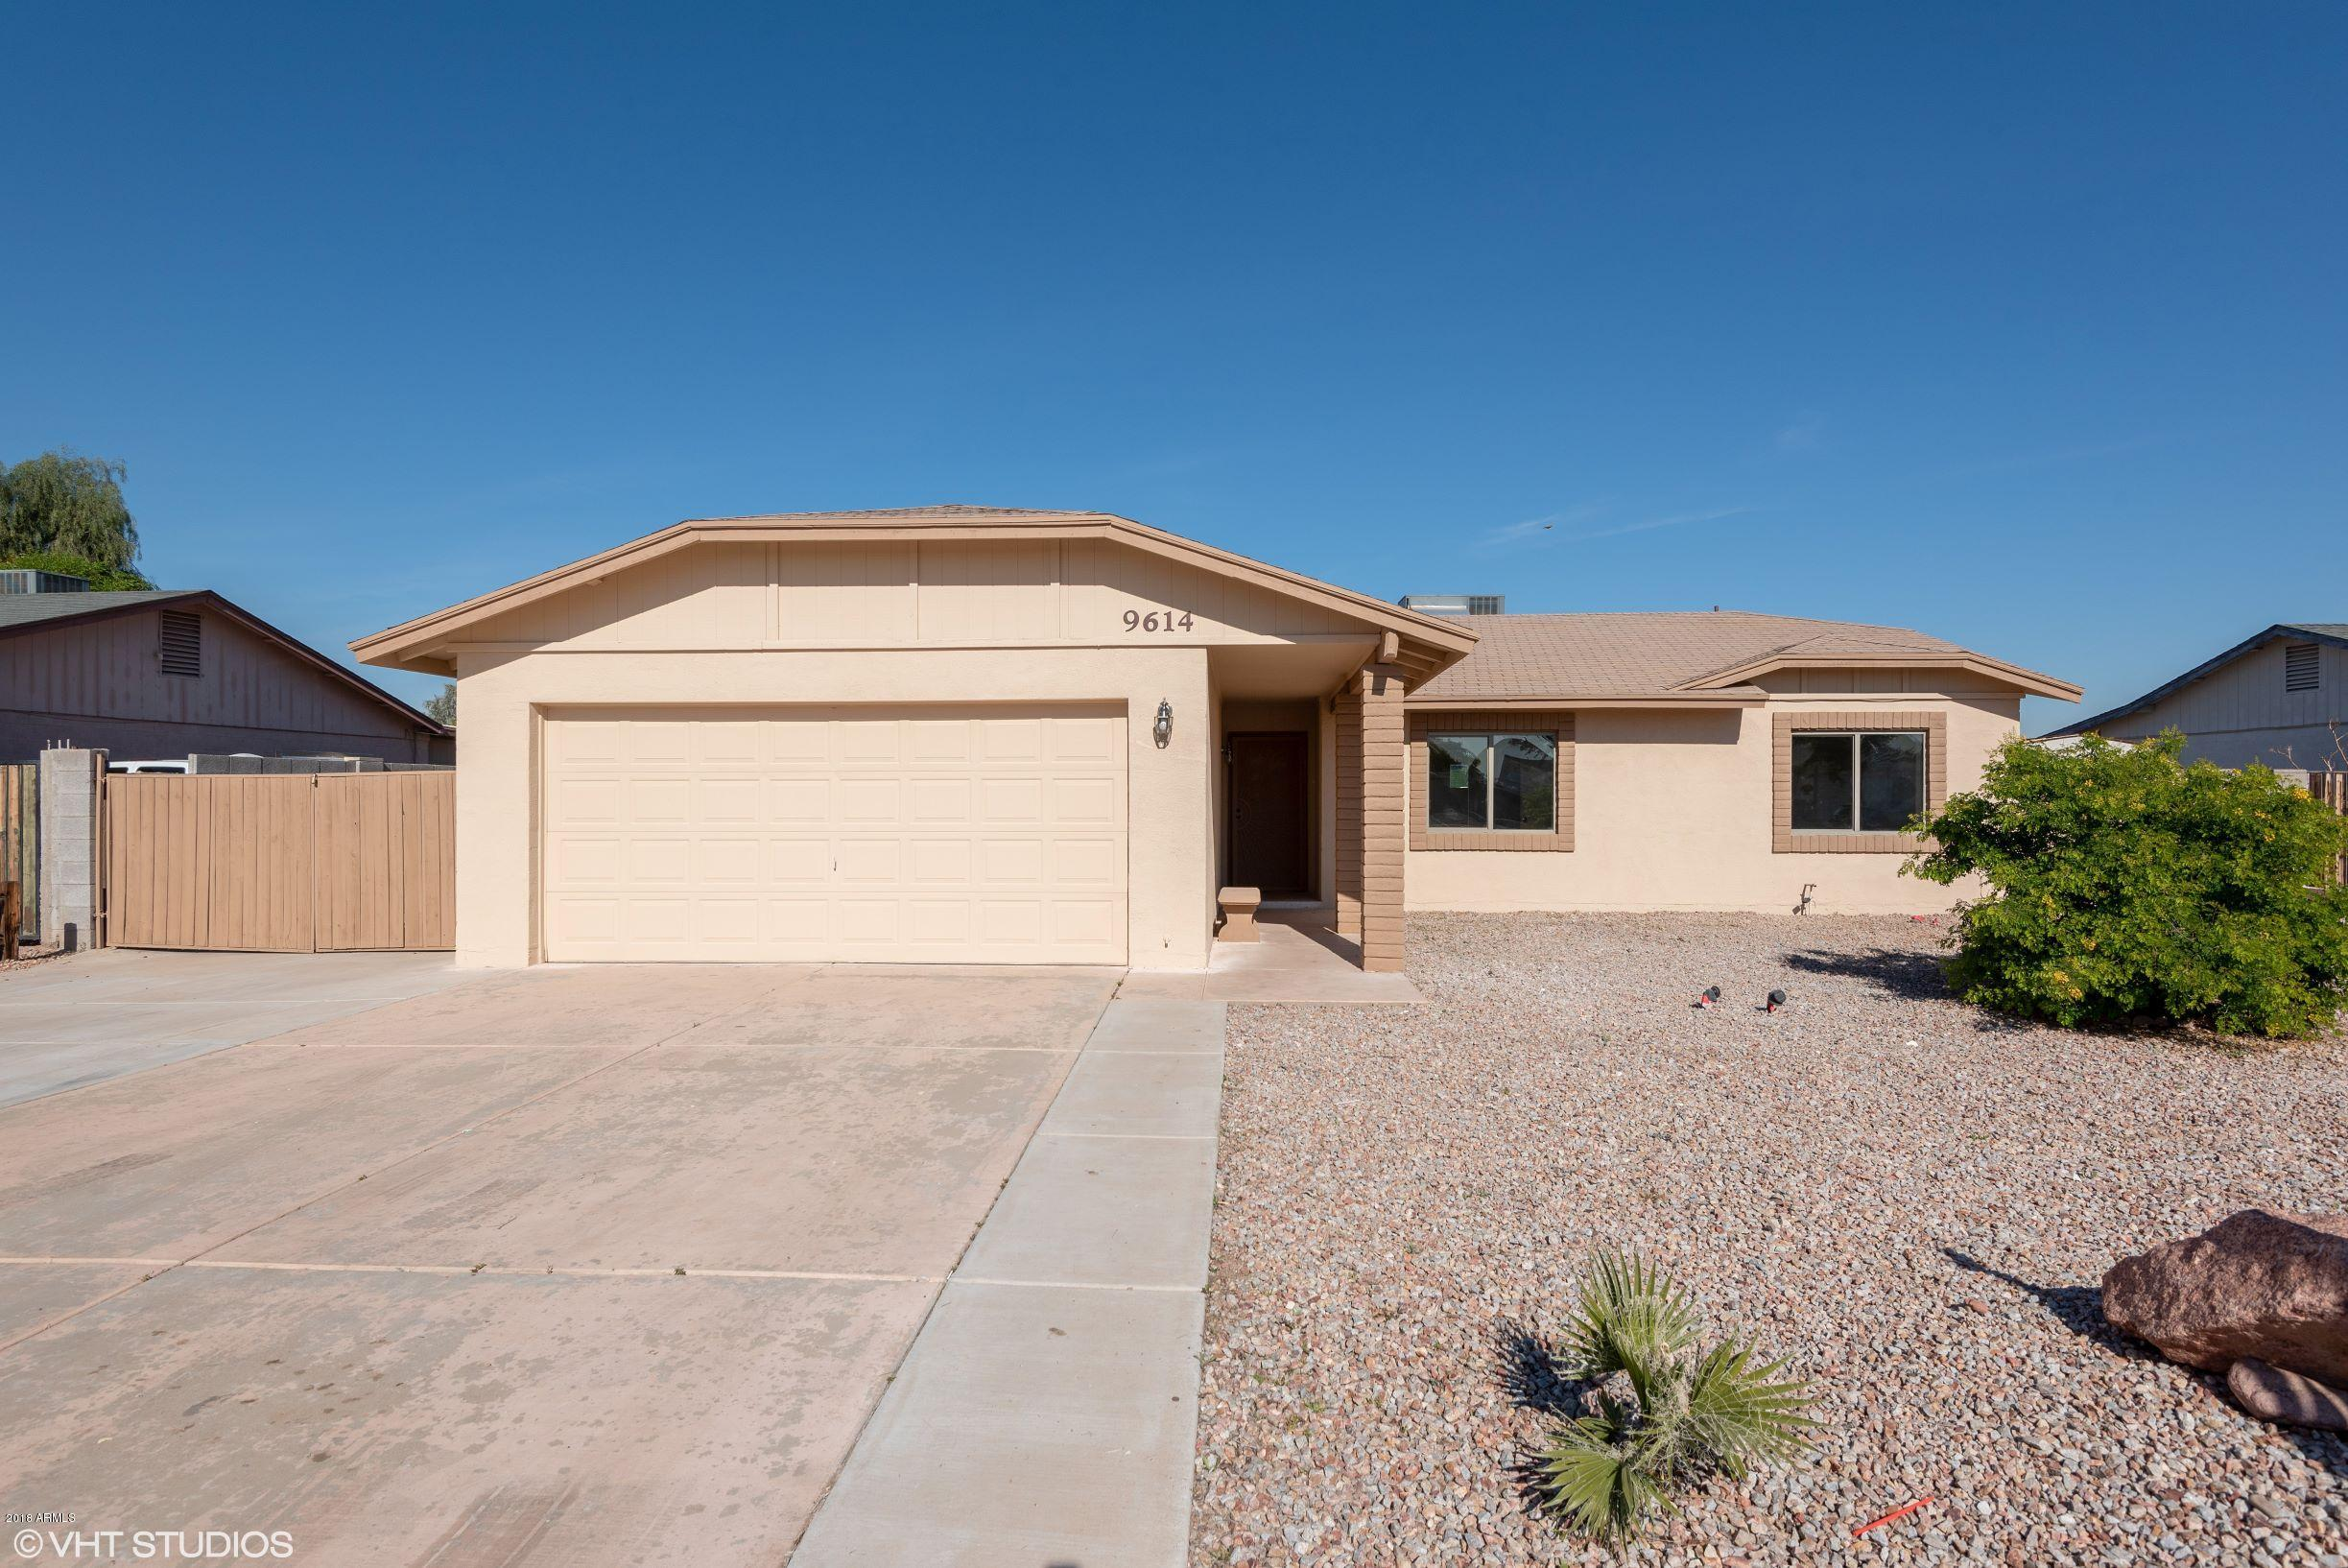 Photo of 9614 W LAS PALMARITAS Drive, Peoria, AZ 85345